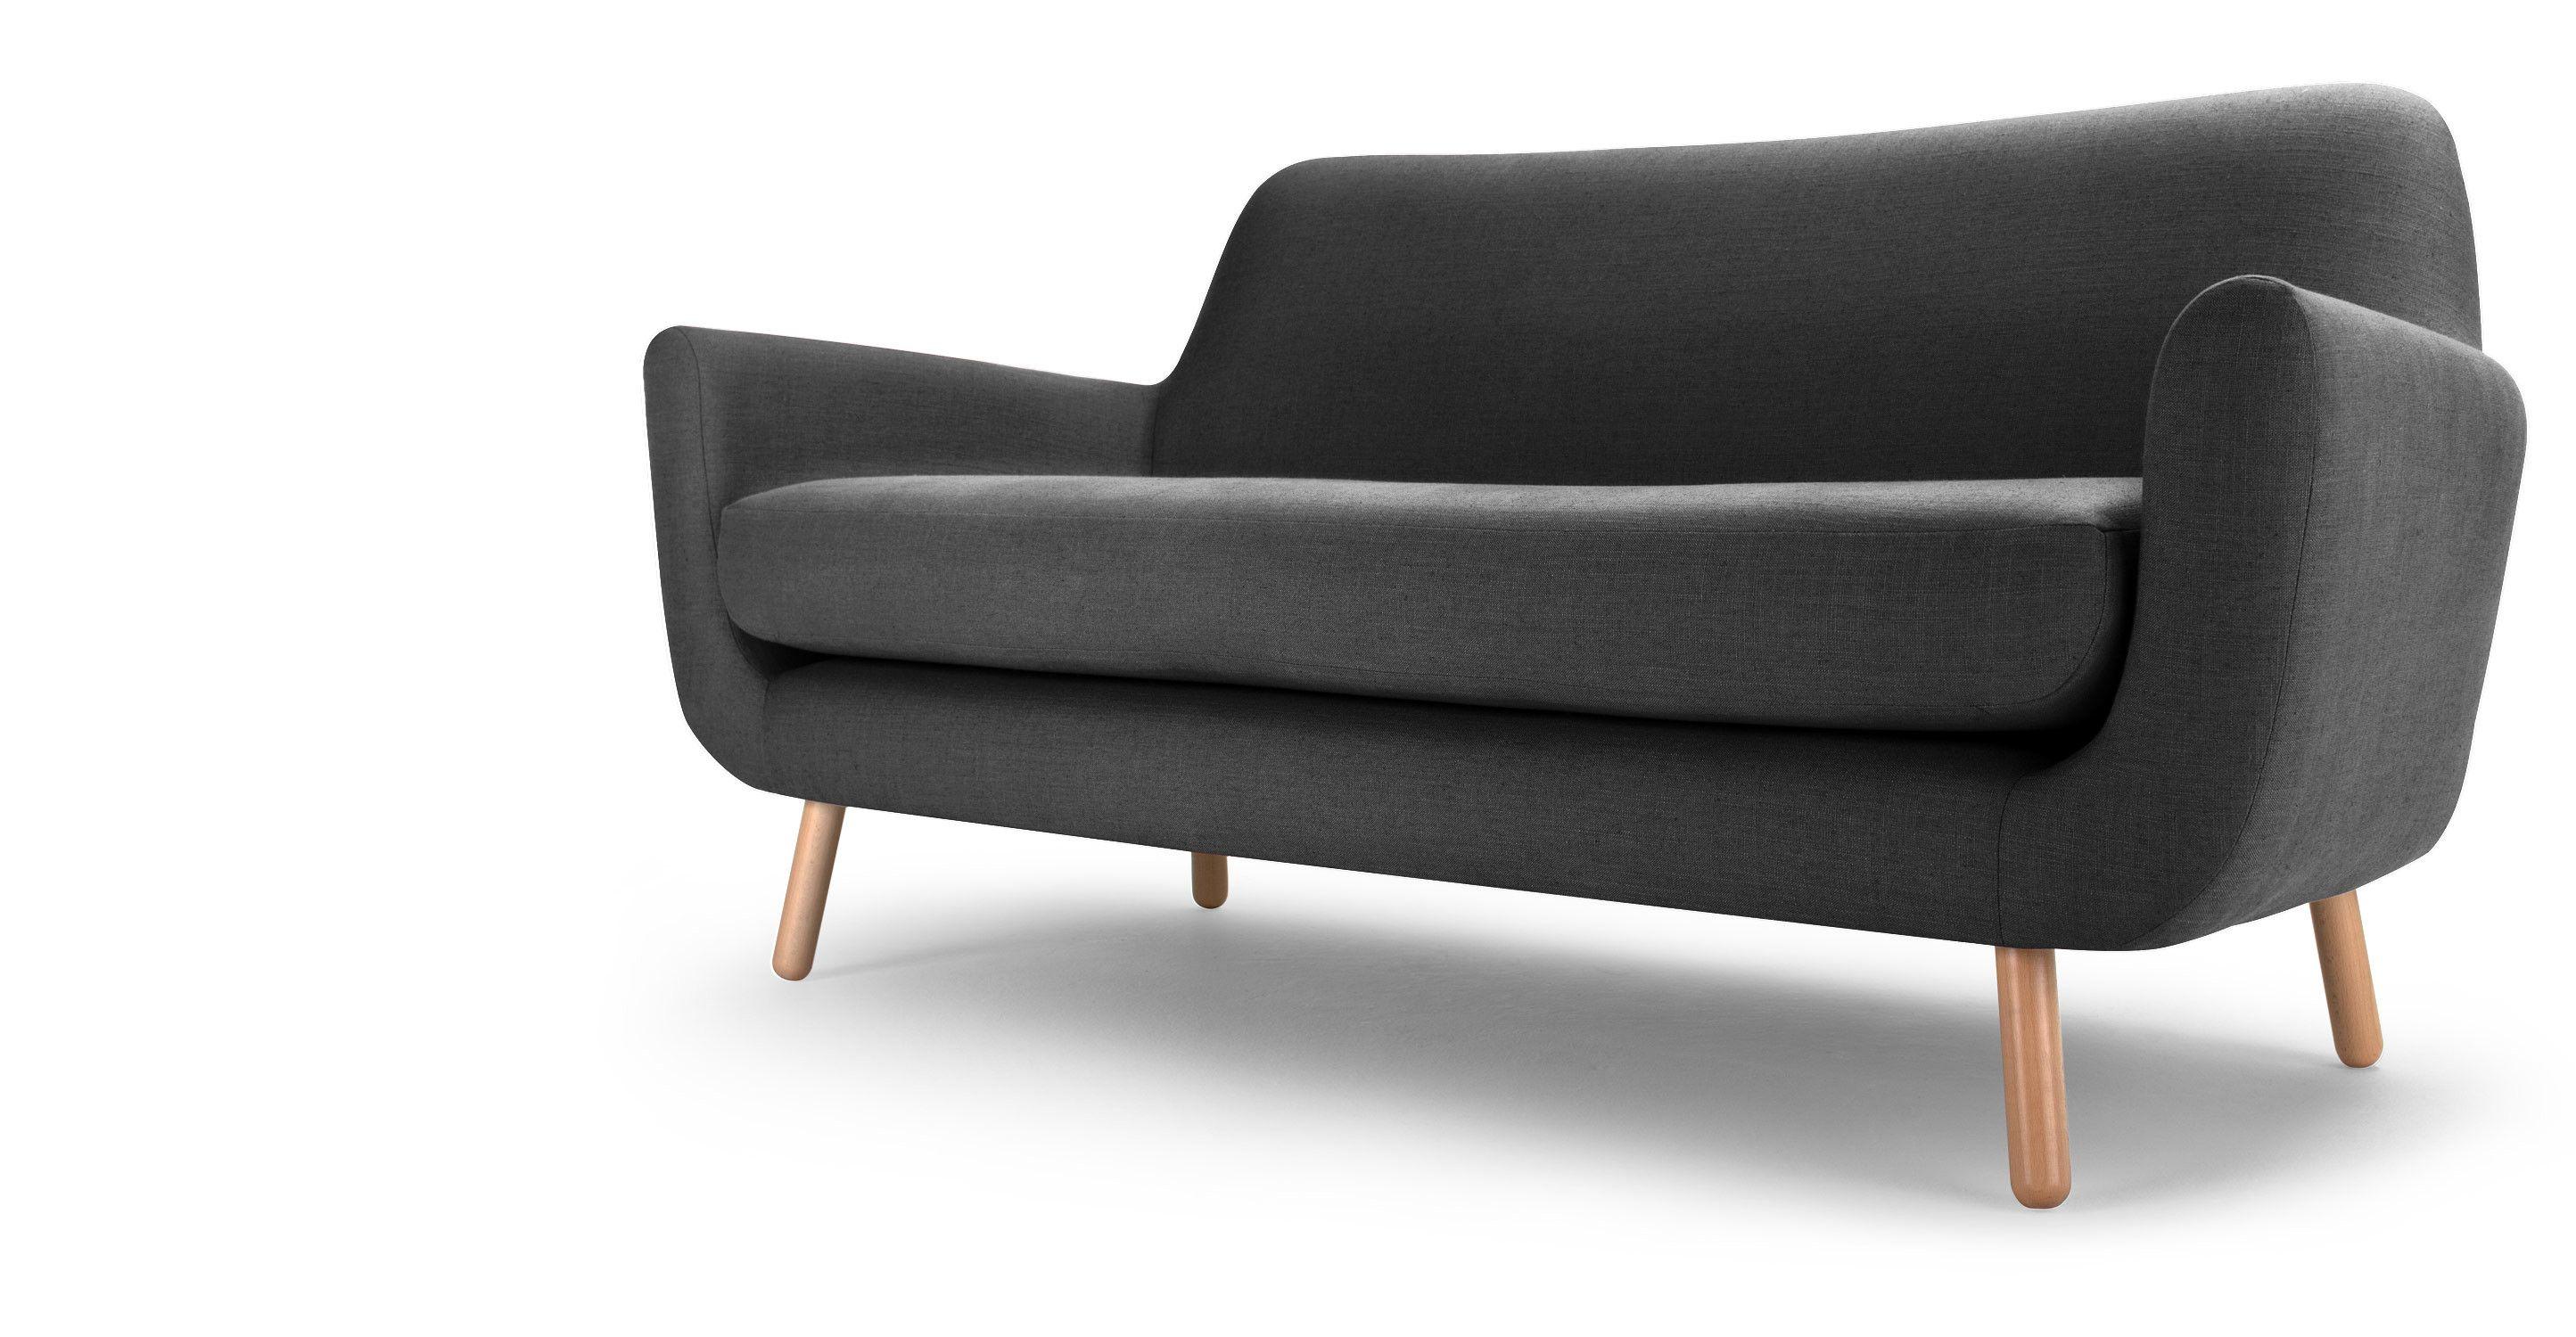 Jonah 2 seater sofa in shire grey jonah 2 seater sofa in shire grey made parisarafo Choice Image